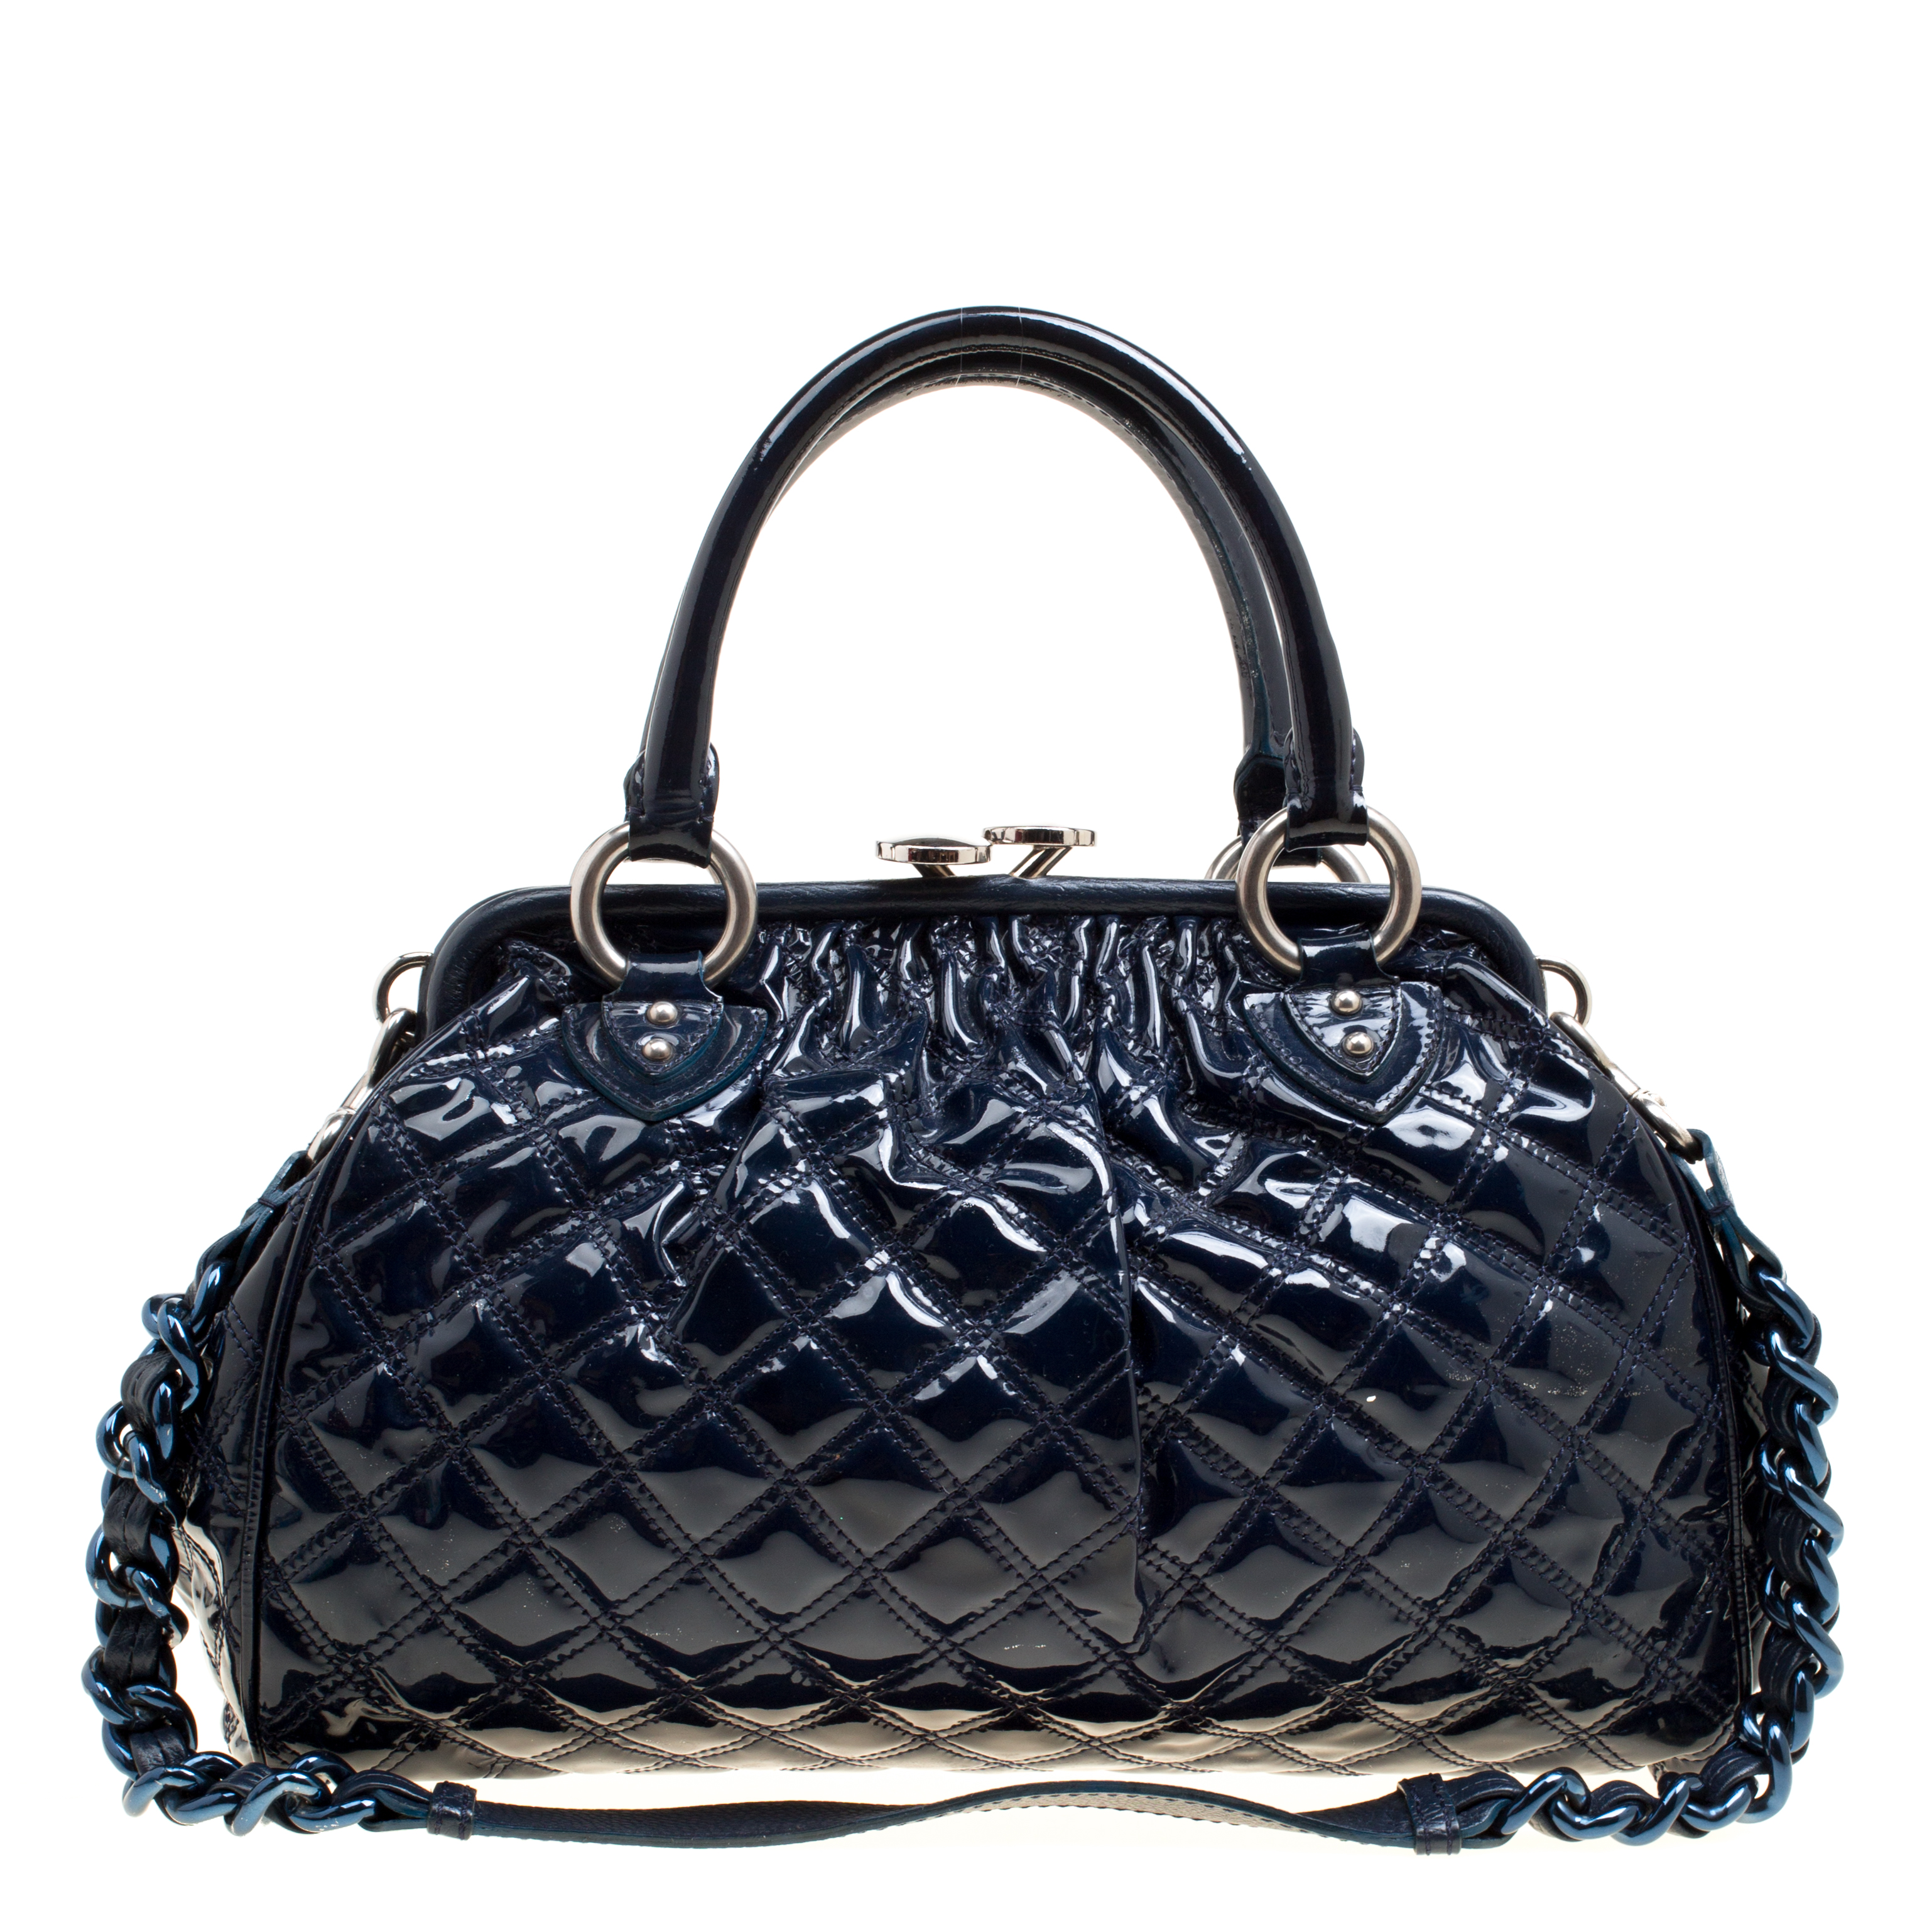 f50ad6b4a8 ... Marc Jacobs Dark Blue Quilted Patent Leather Stam Top Handle Shoulder  Bag. nextprev. prevnext